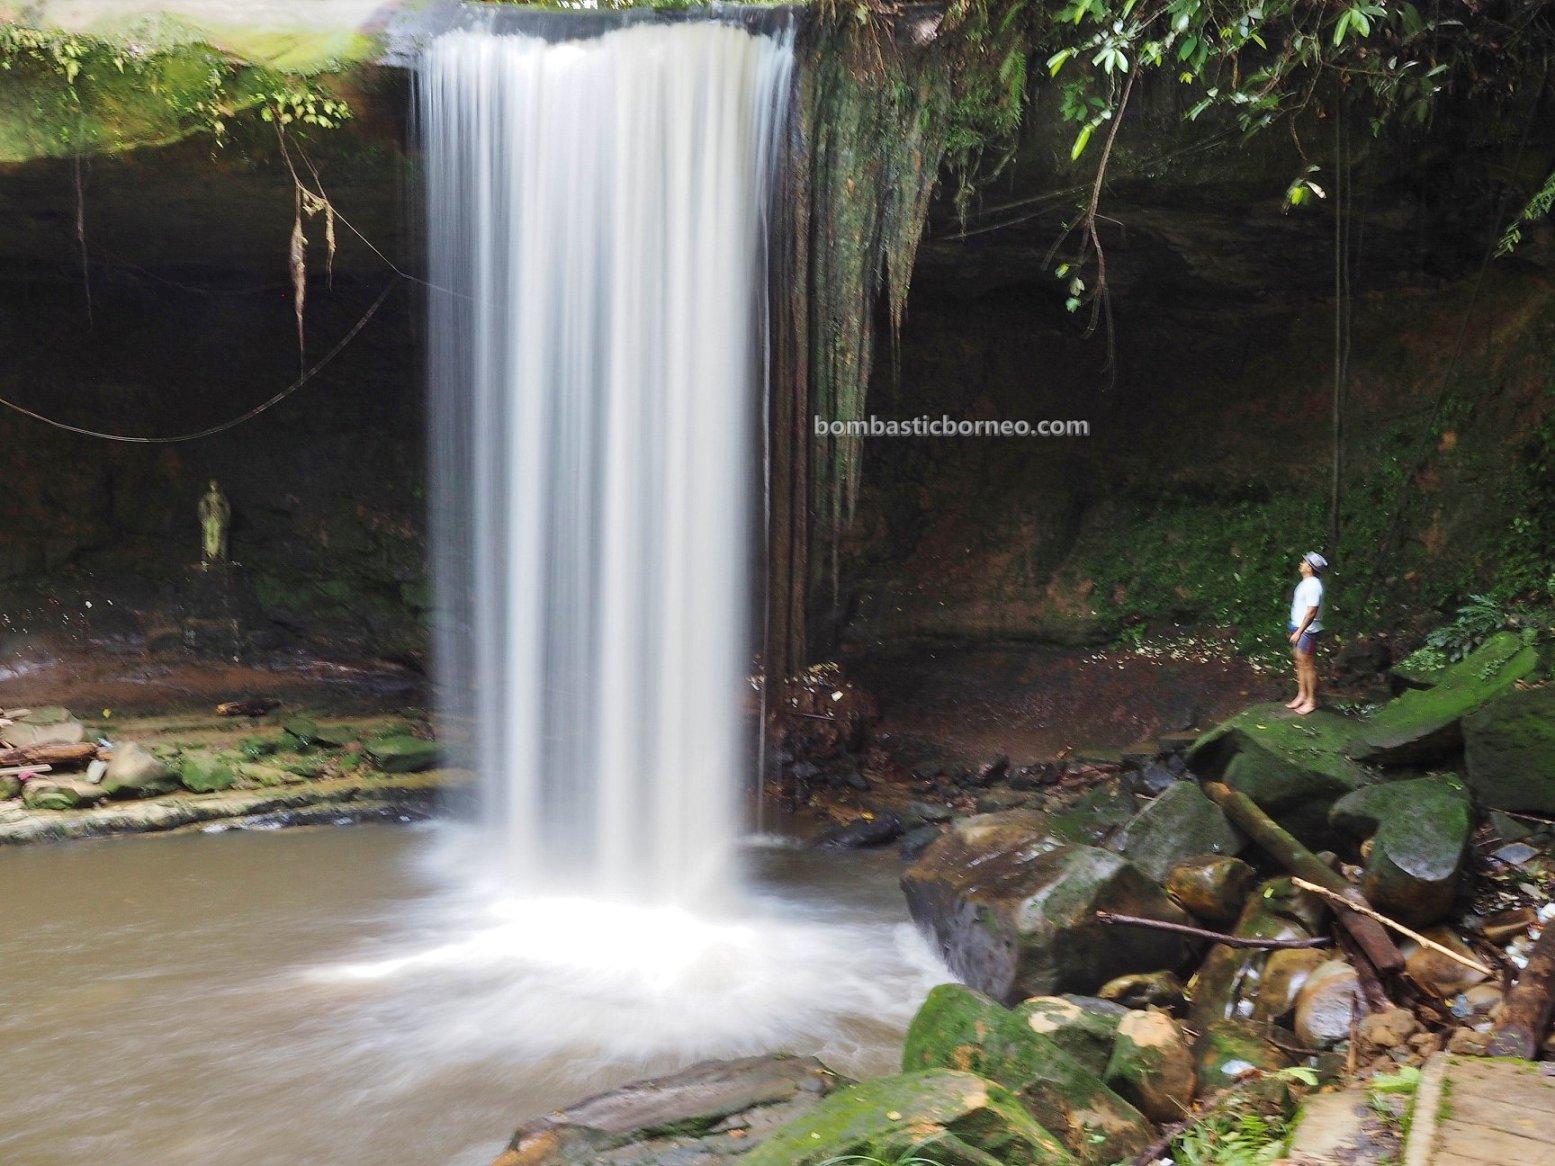 Virgin Mary Grotto, air terjun, Riam Macan, catholic, katolik, backpackers, Borneo, Kalimantan Barat, Tourism, tourist attraction, travel guide, 印尼西加里曼丹, 上侯旅游景点,